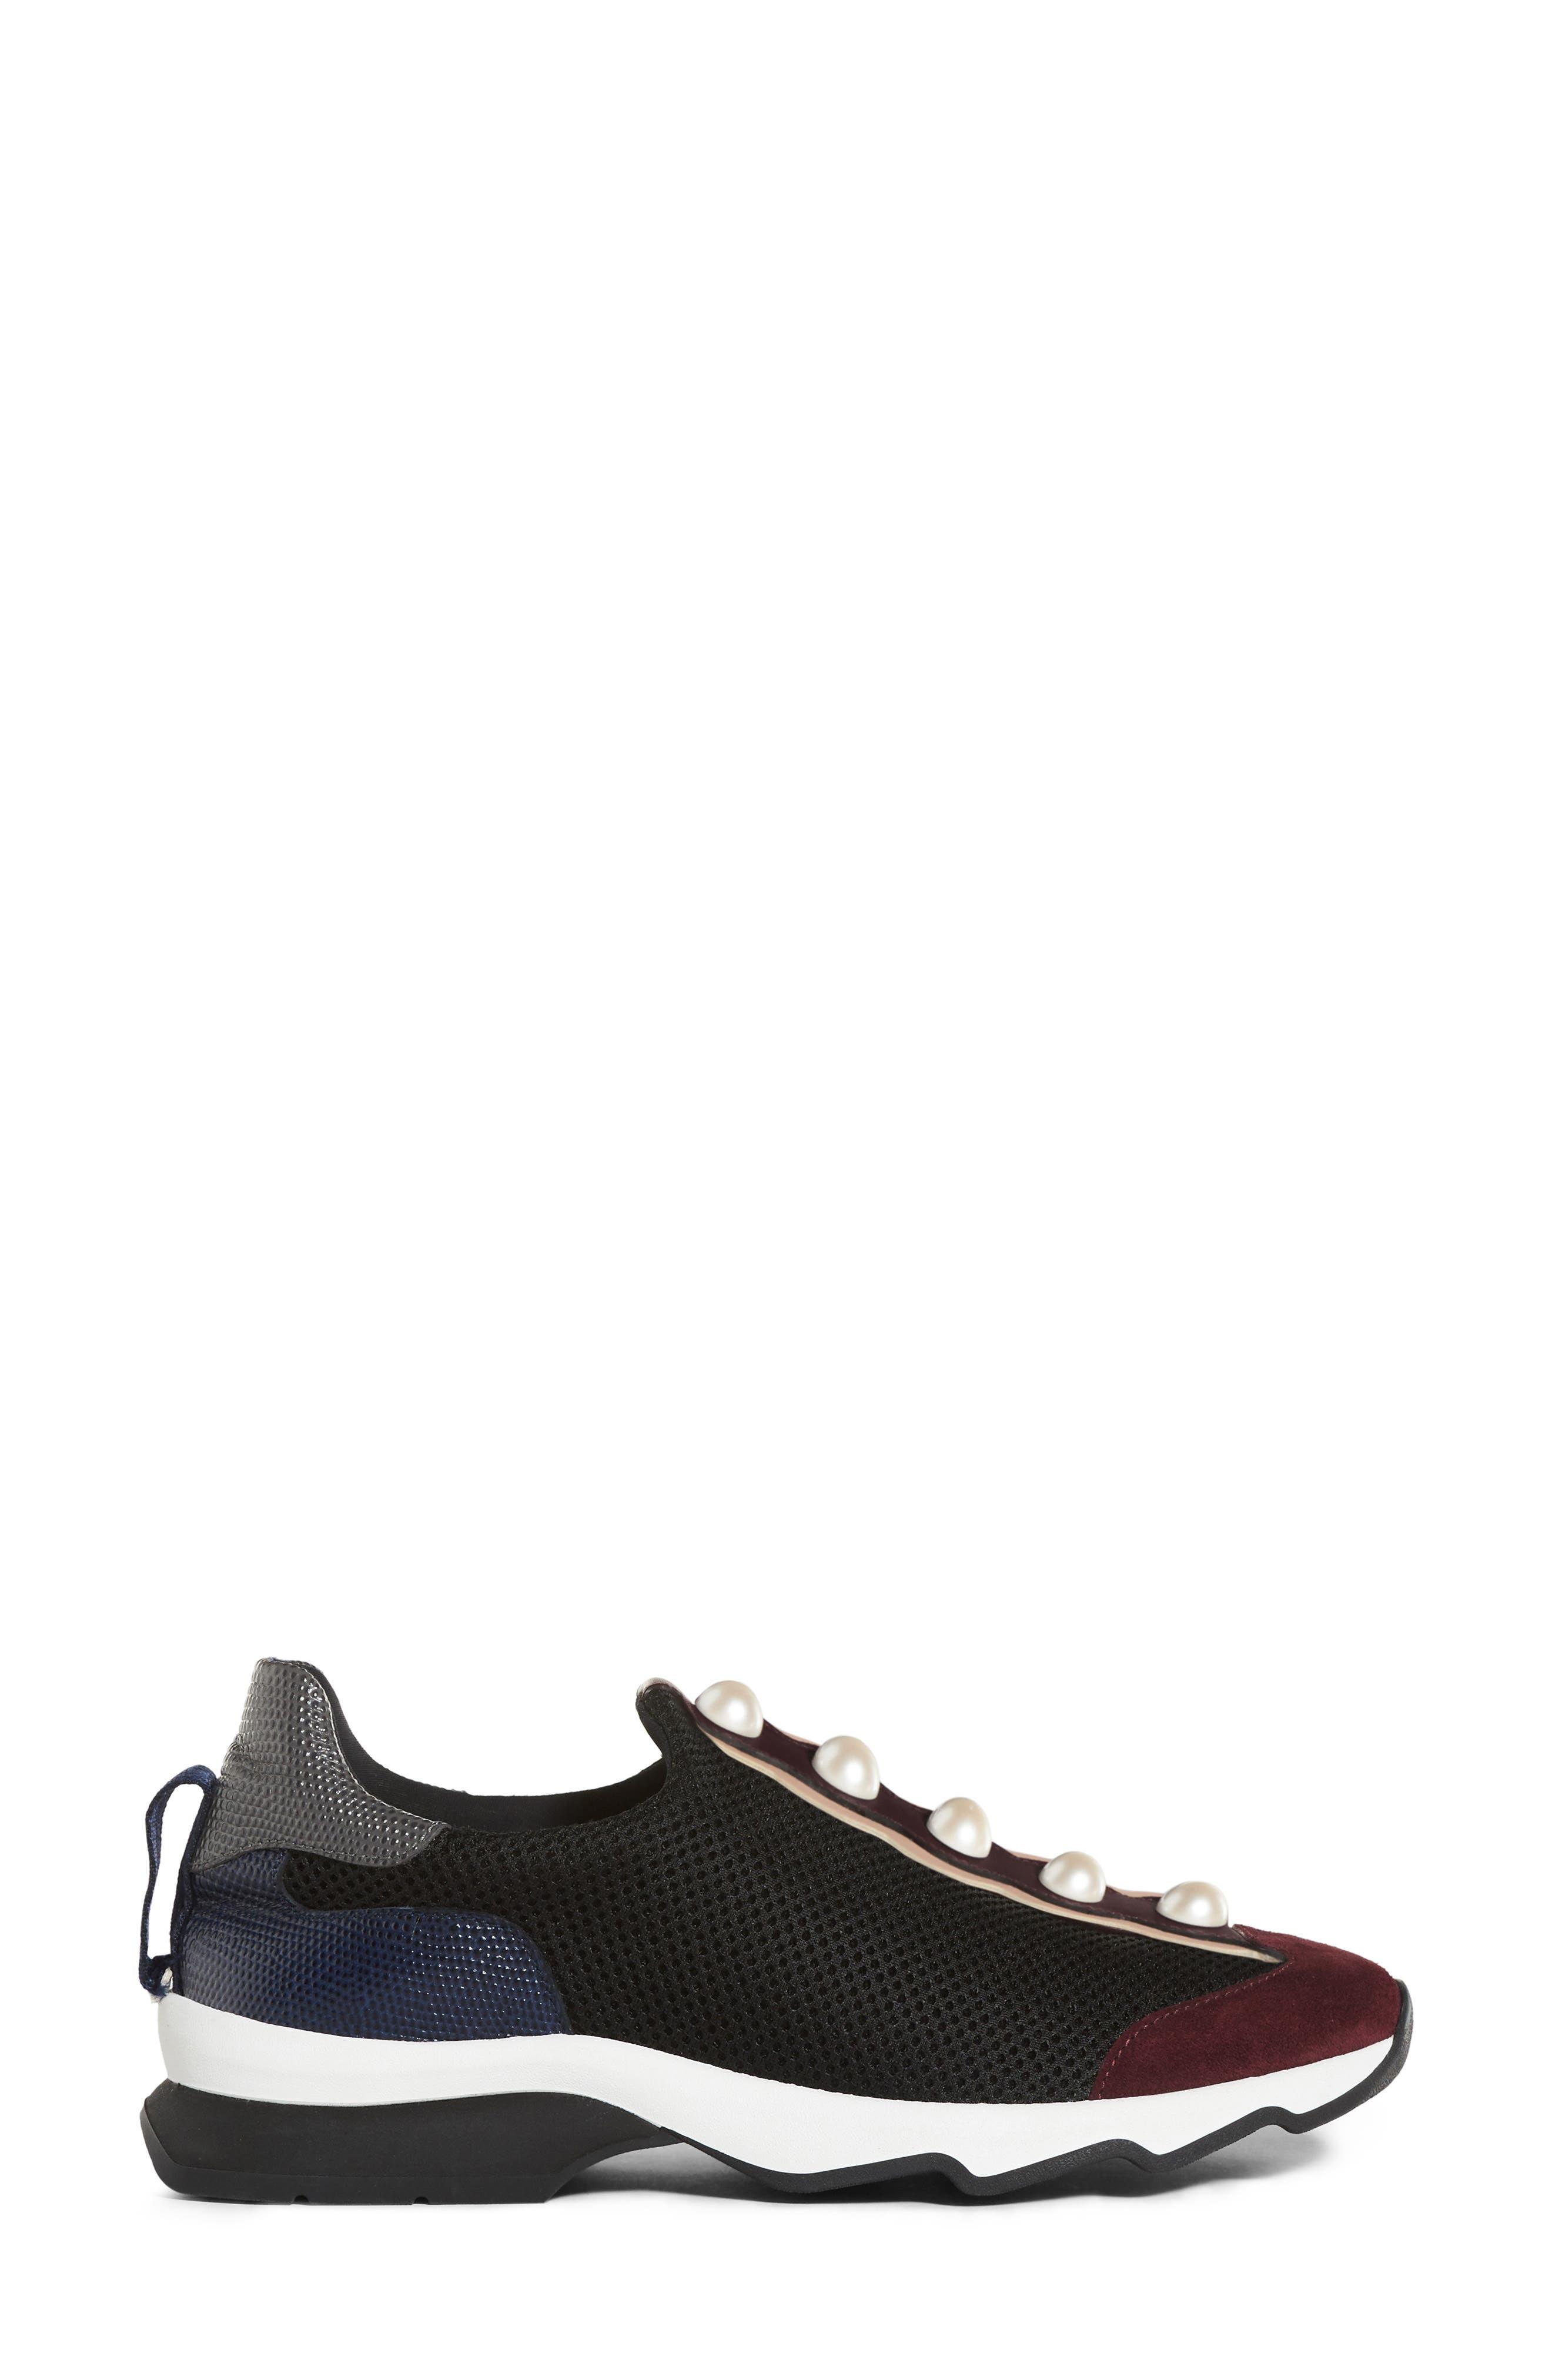 Pearland Slip-On Sneaker,                             Alternate thumbnail 3, color,